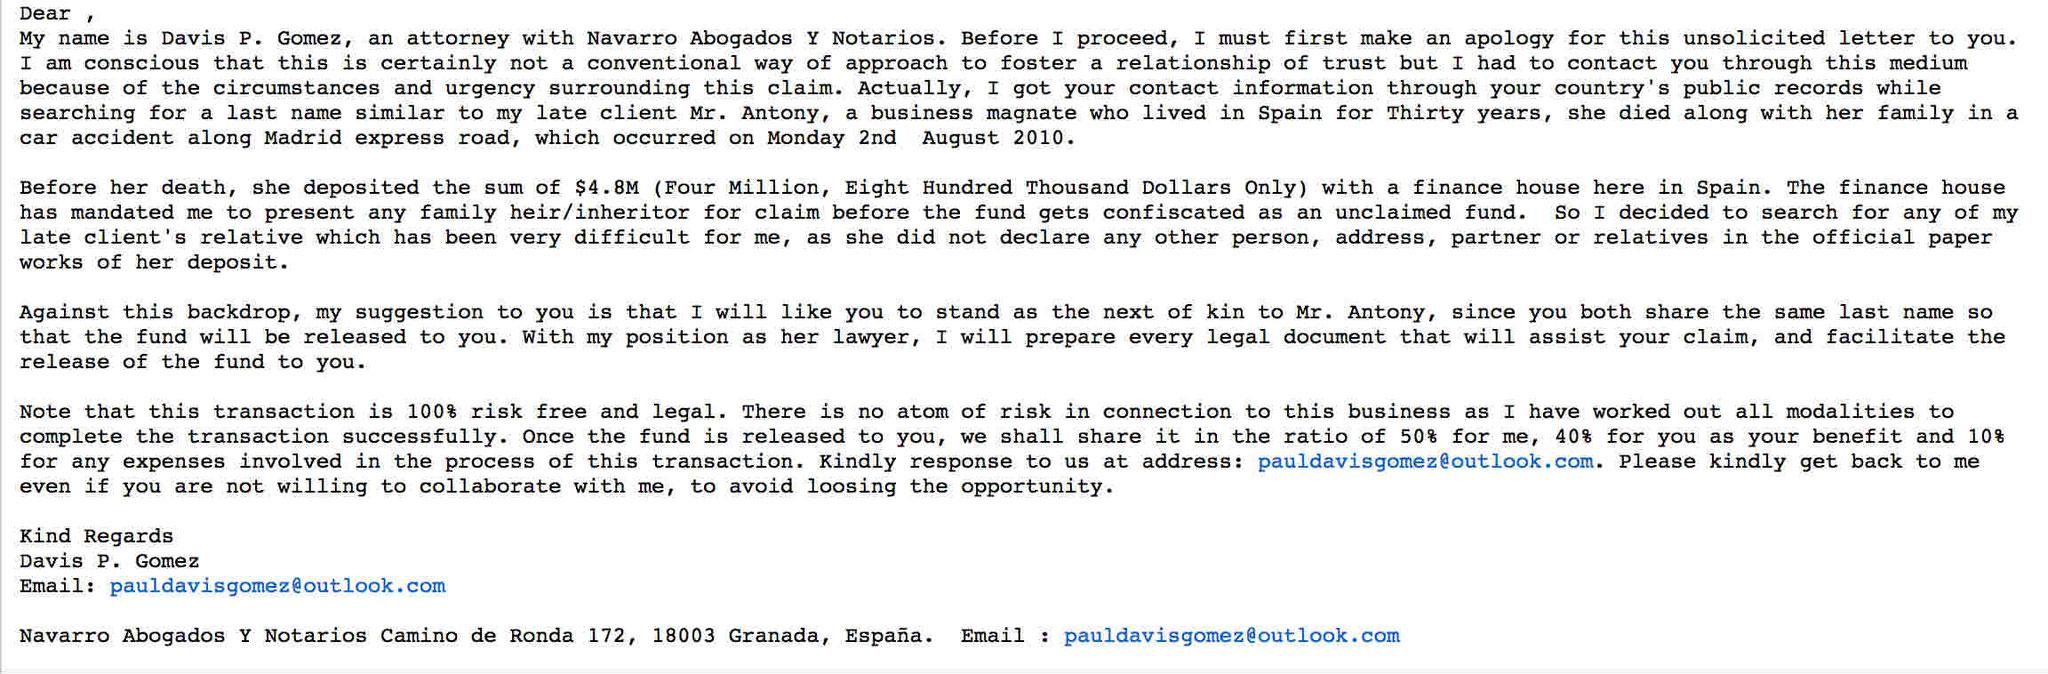 Navarro Abogados Y Notarios fraud scam phishing email